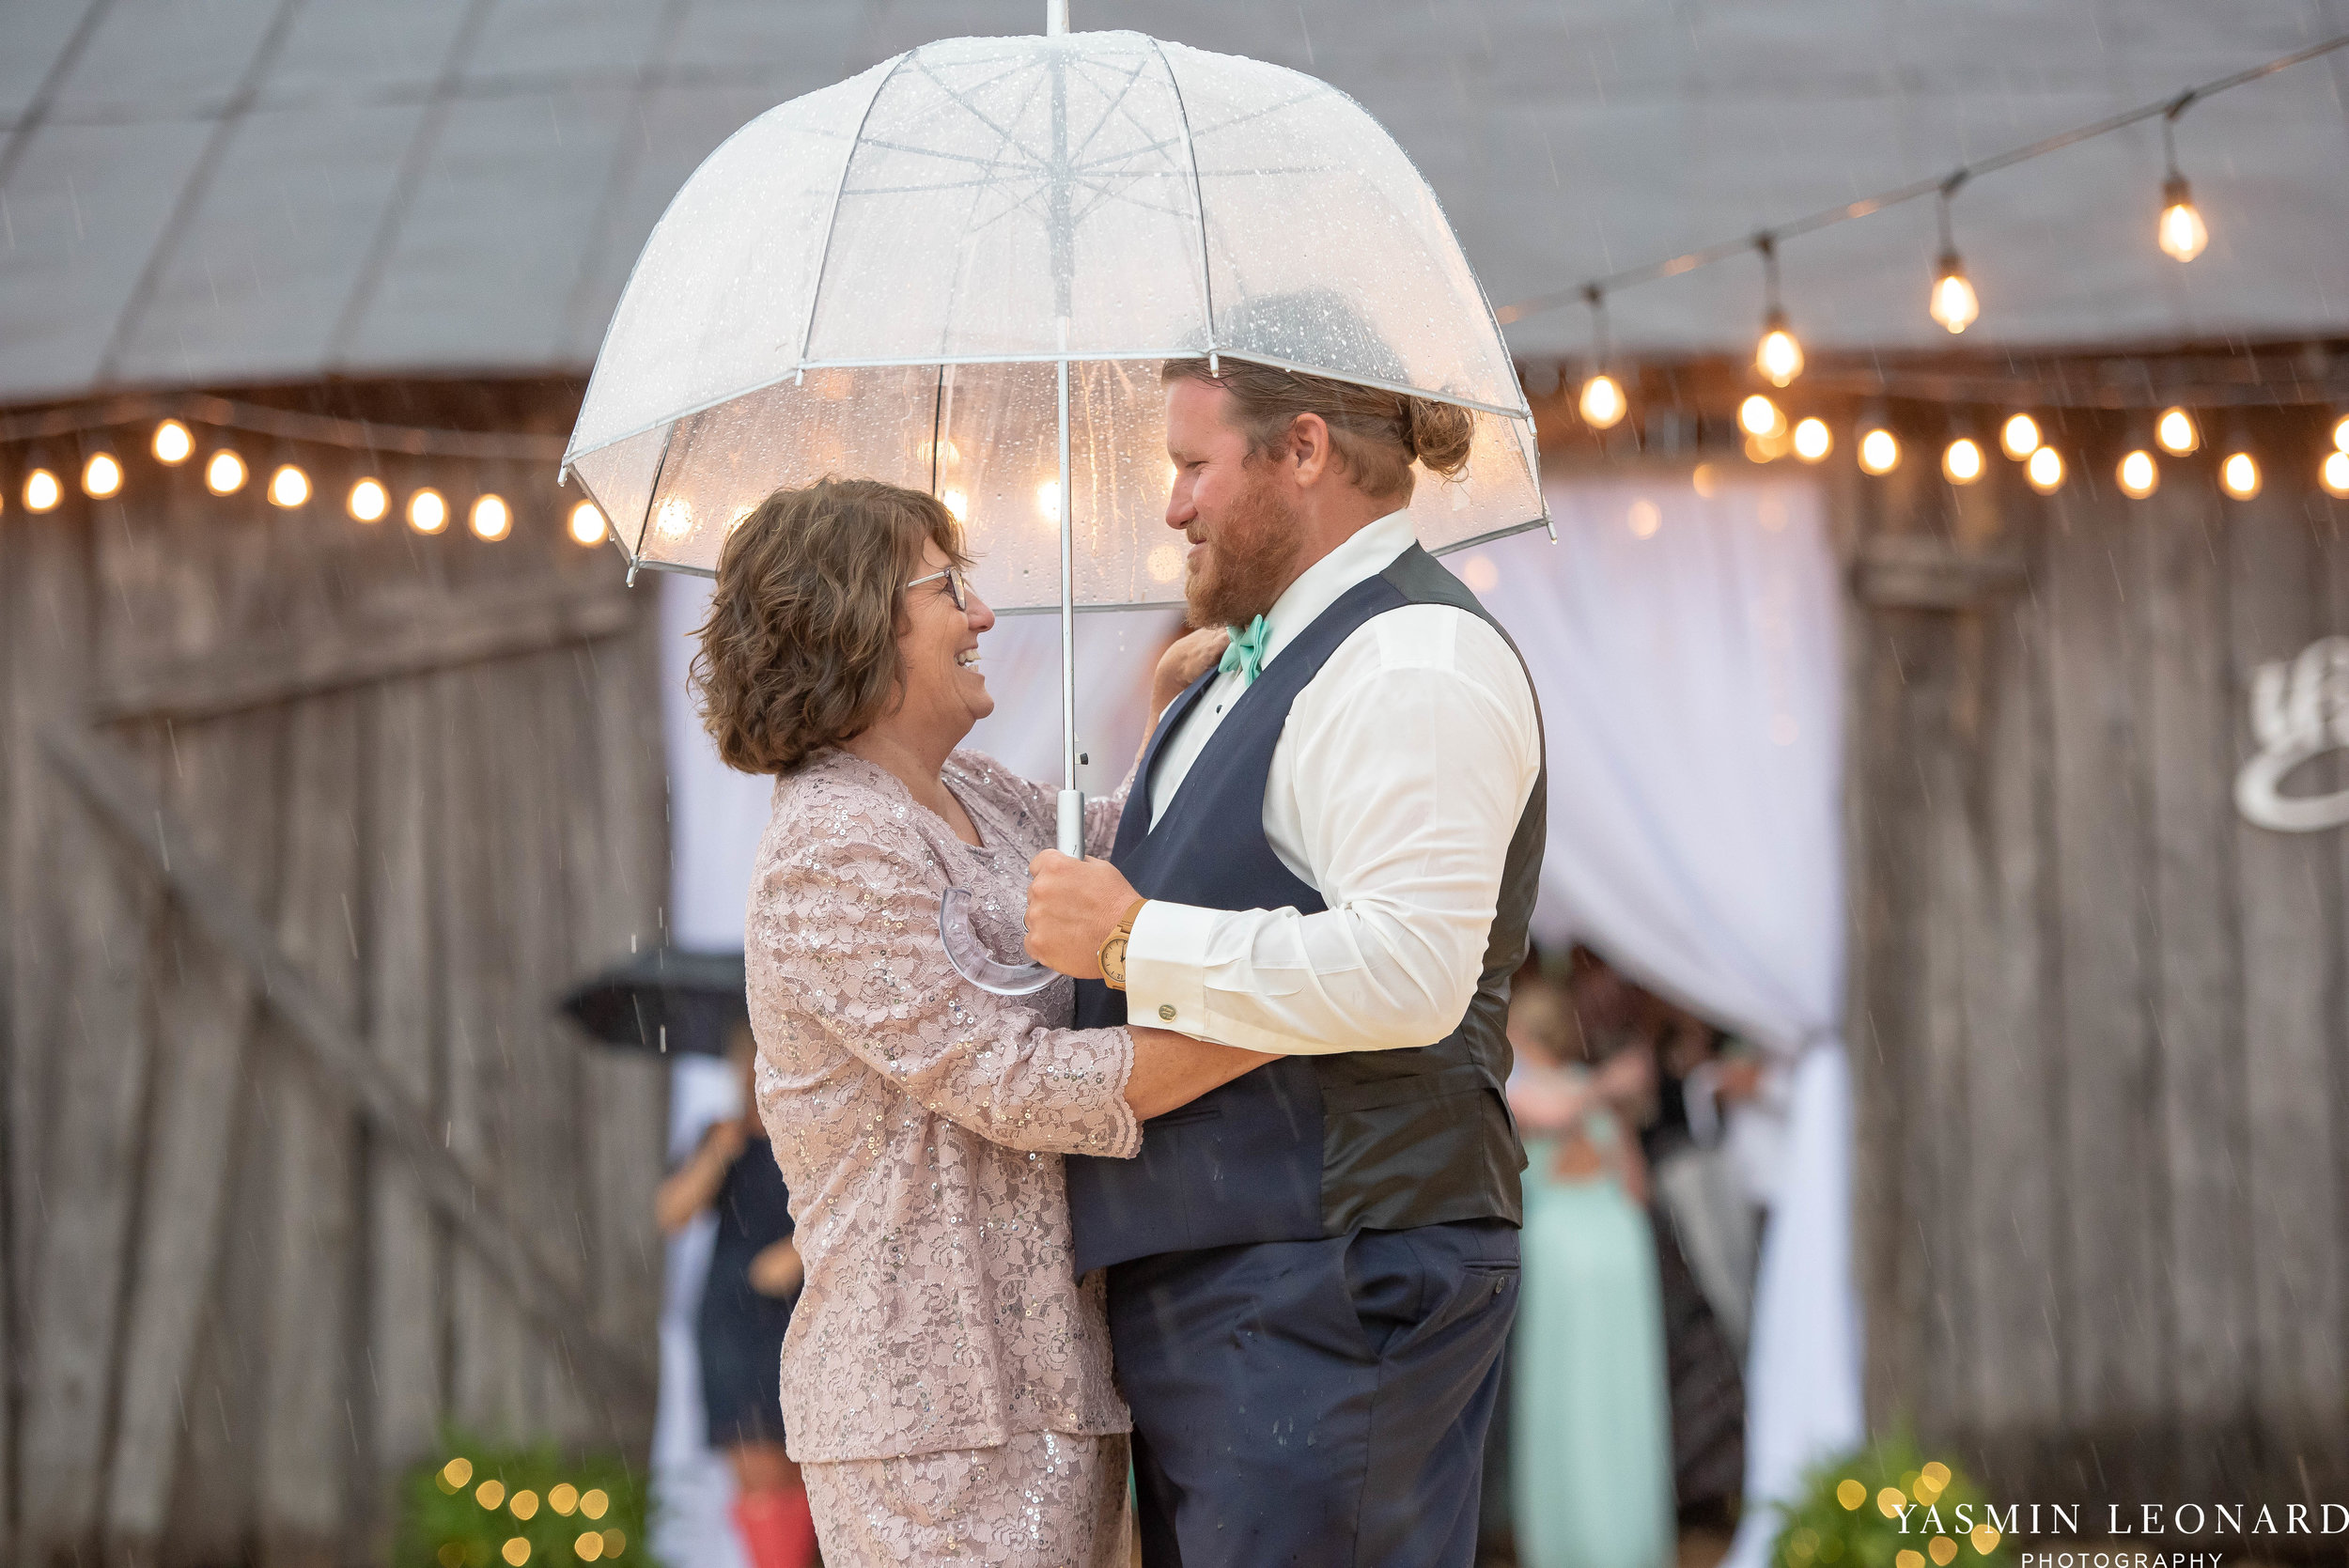 Rain on your wedding day - Rainy Wedding - Plan B for Rain - What to do if it rains on your wedding day - Wedding Inspiration - Outdoor wedding ideas - Rainy Wedding Pictures - Yasmin Leonard Photography-75.jpg